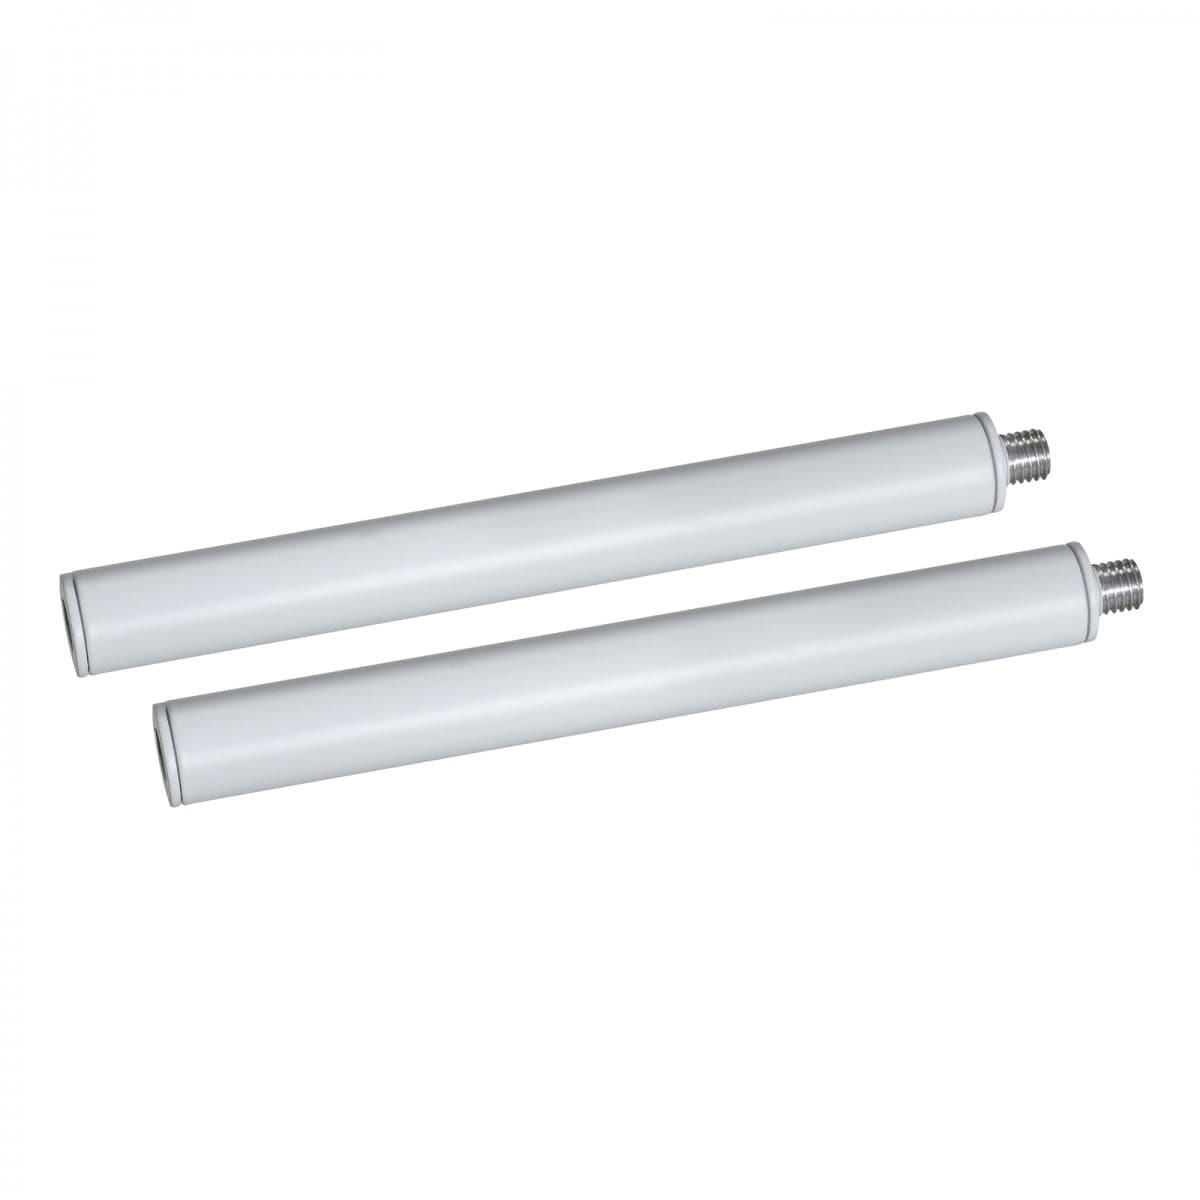 Extension / Rallonge 300mm pour gamme THE (Elegance)